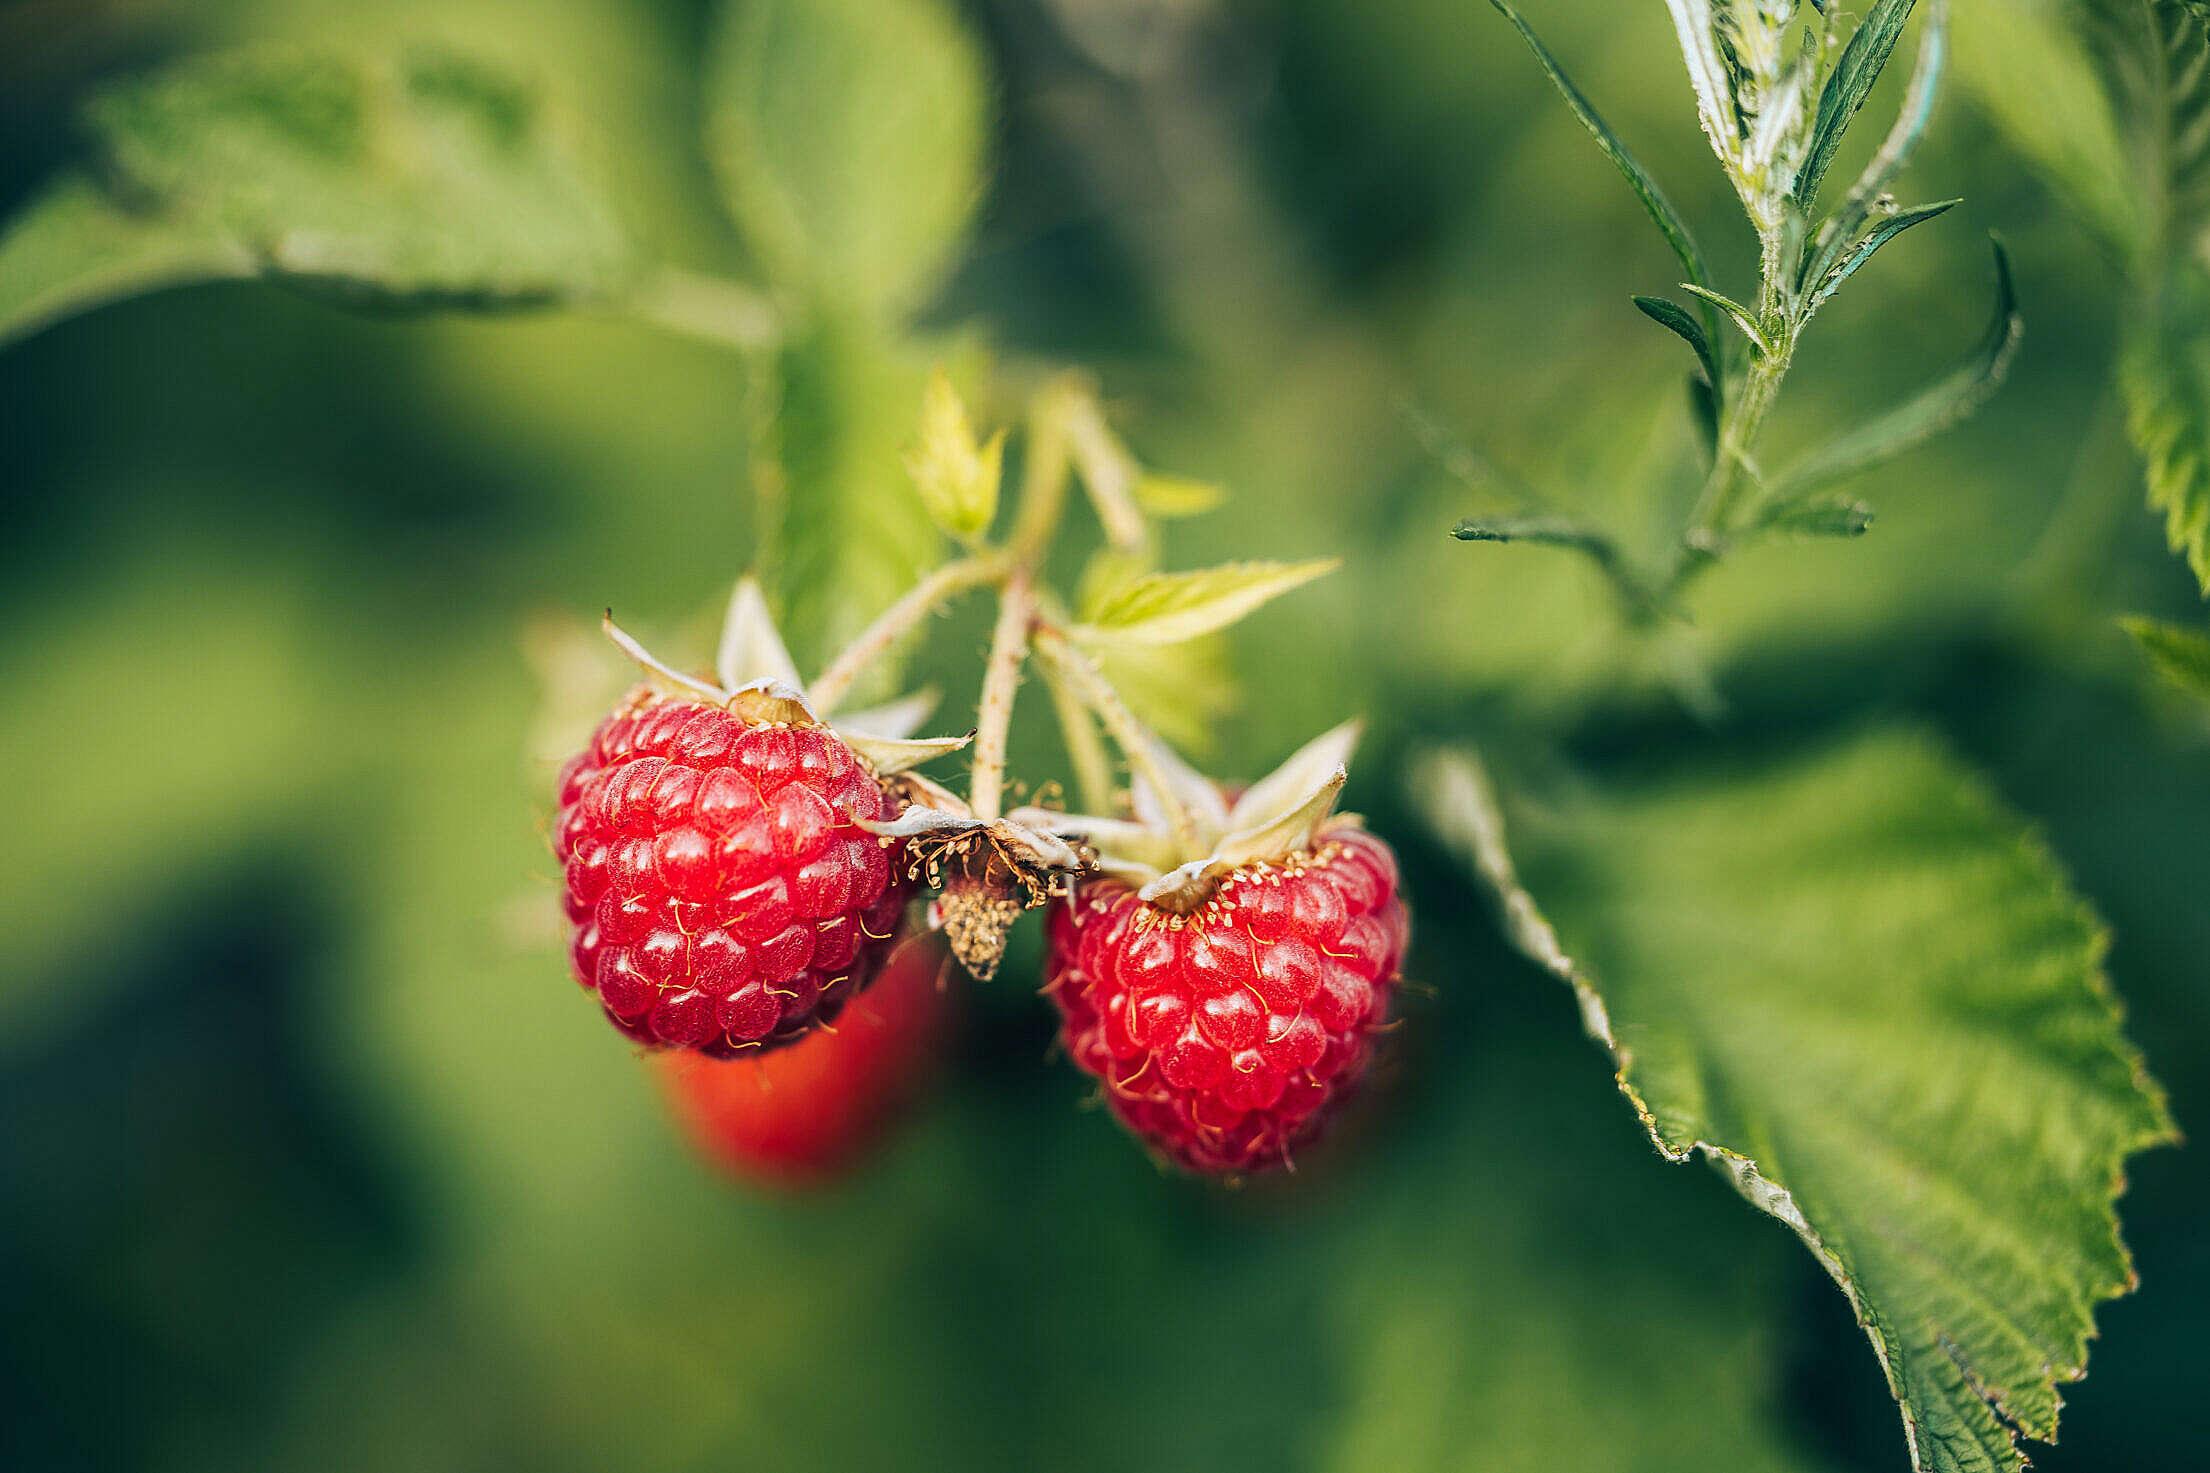 Detail of Raspberries Free Stock Photo